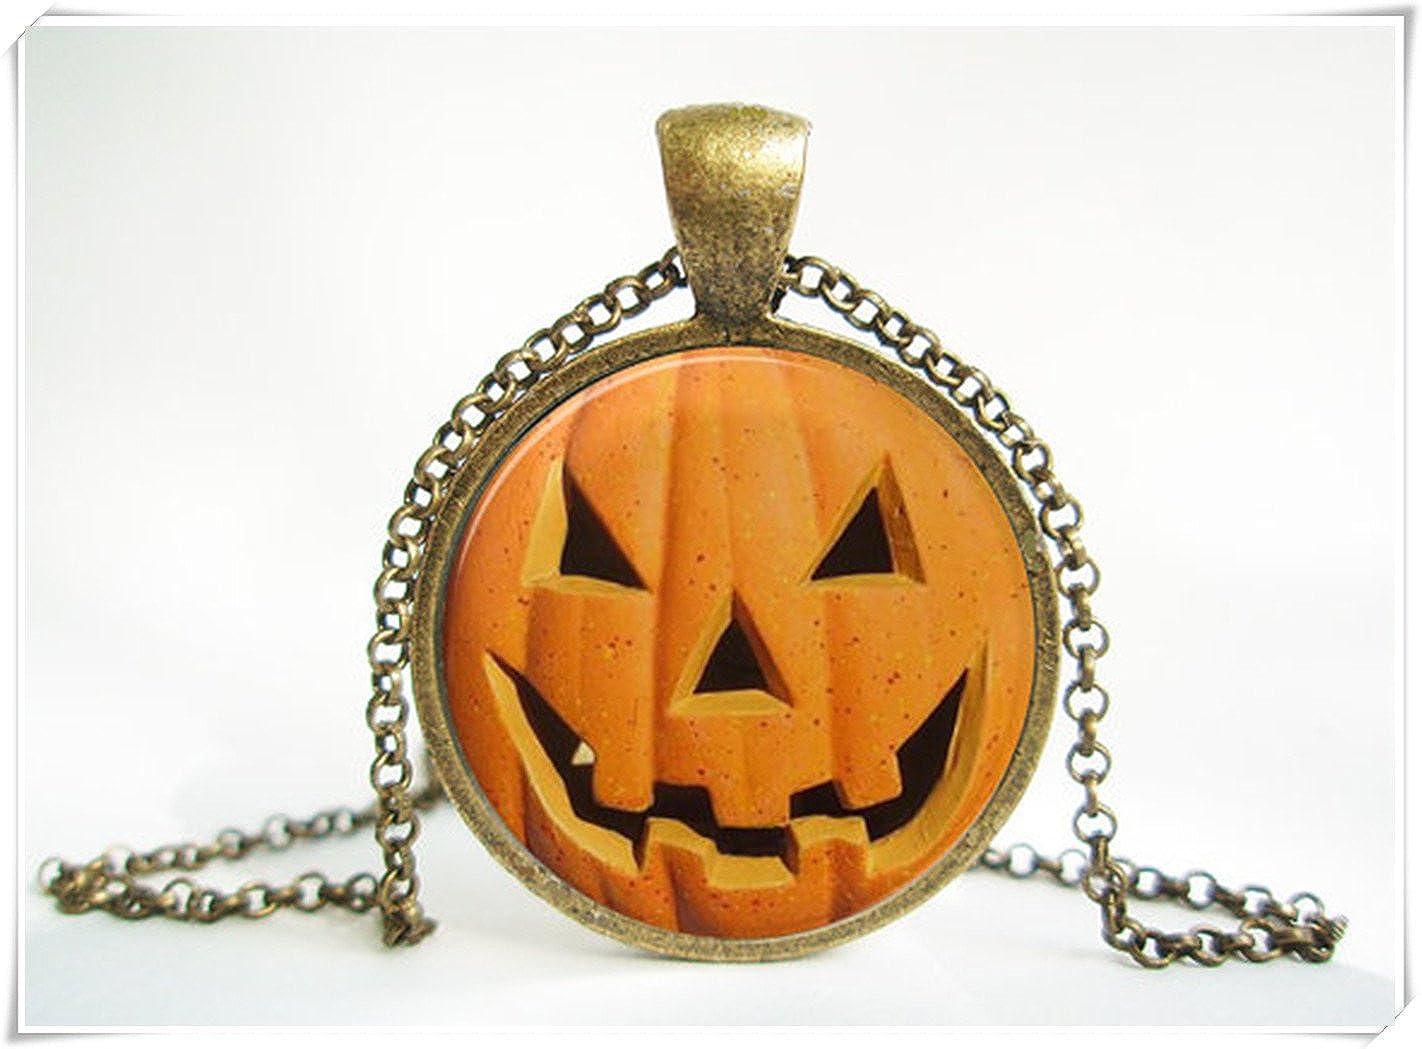 Halloween Jack-o'-Lantern Pendant Necklace,Antique.Bronze ,Dome Glass Ornaments, Pure Handmade wish dandelion